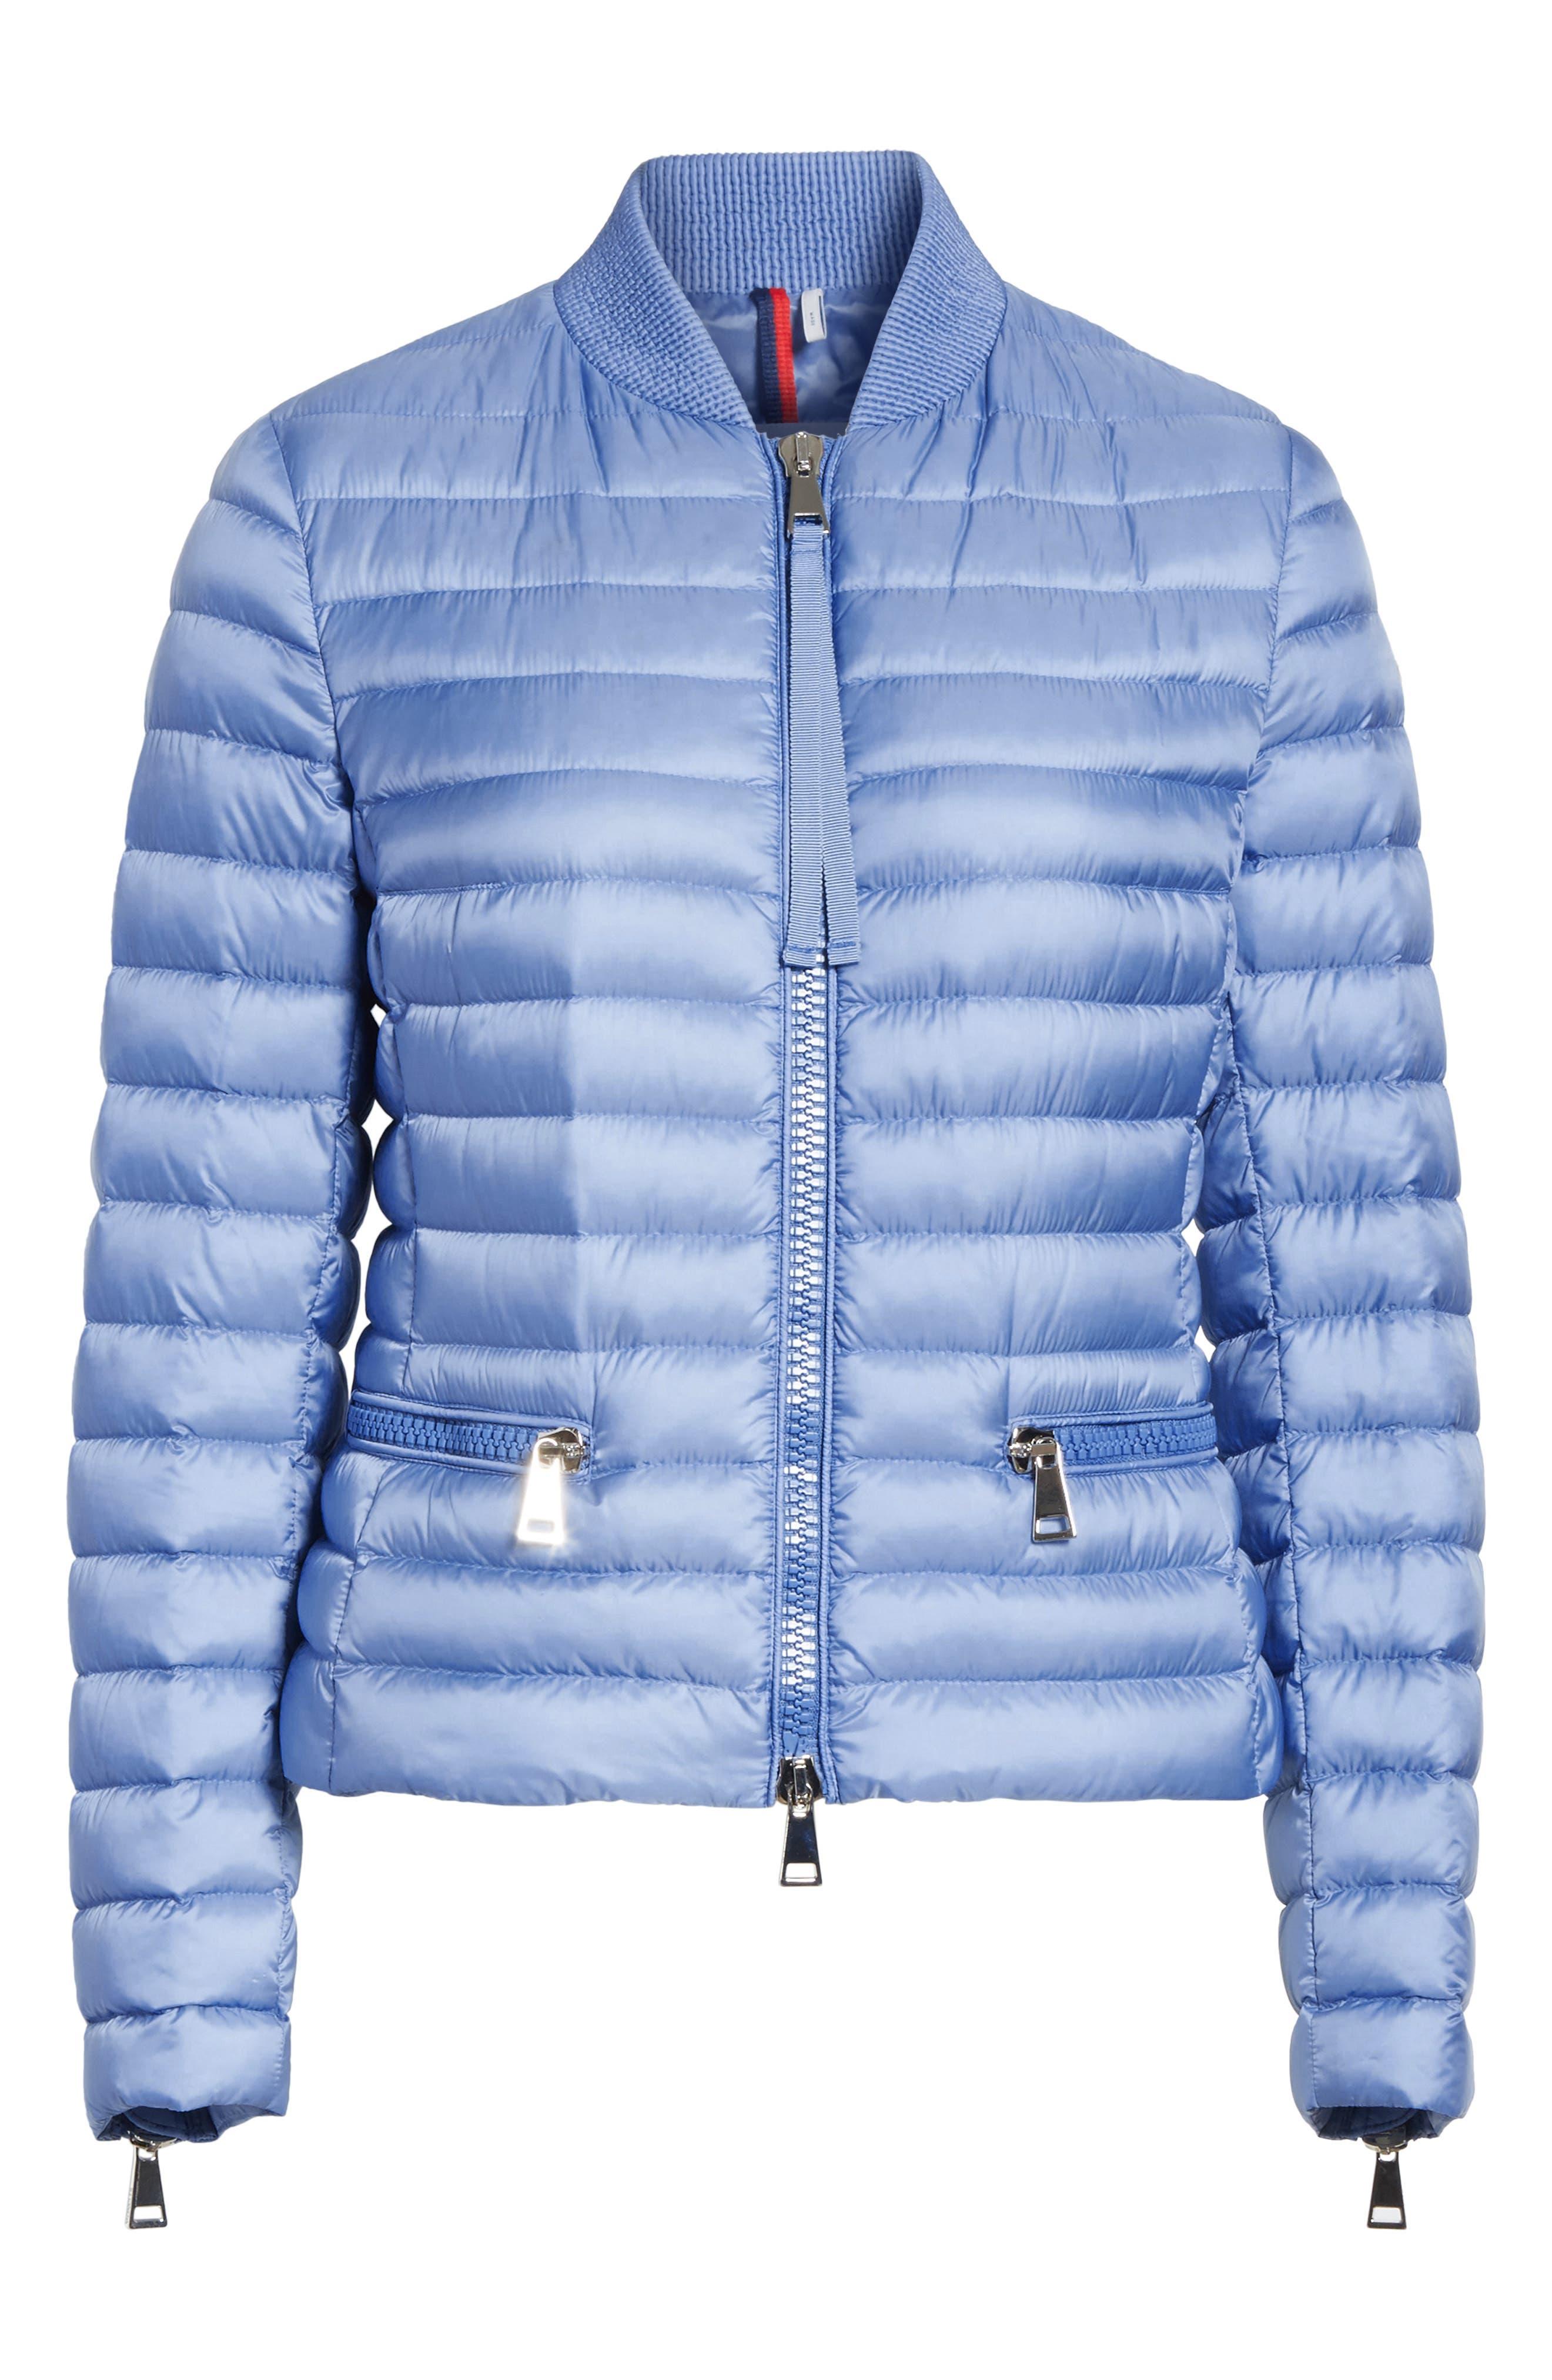 Blen Down Jacket,                             Alternate thumbnail 6, color,                             Blue